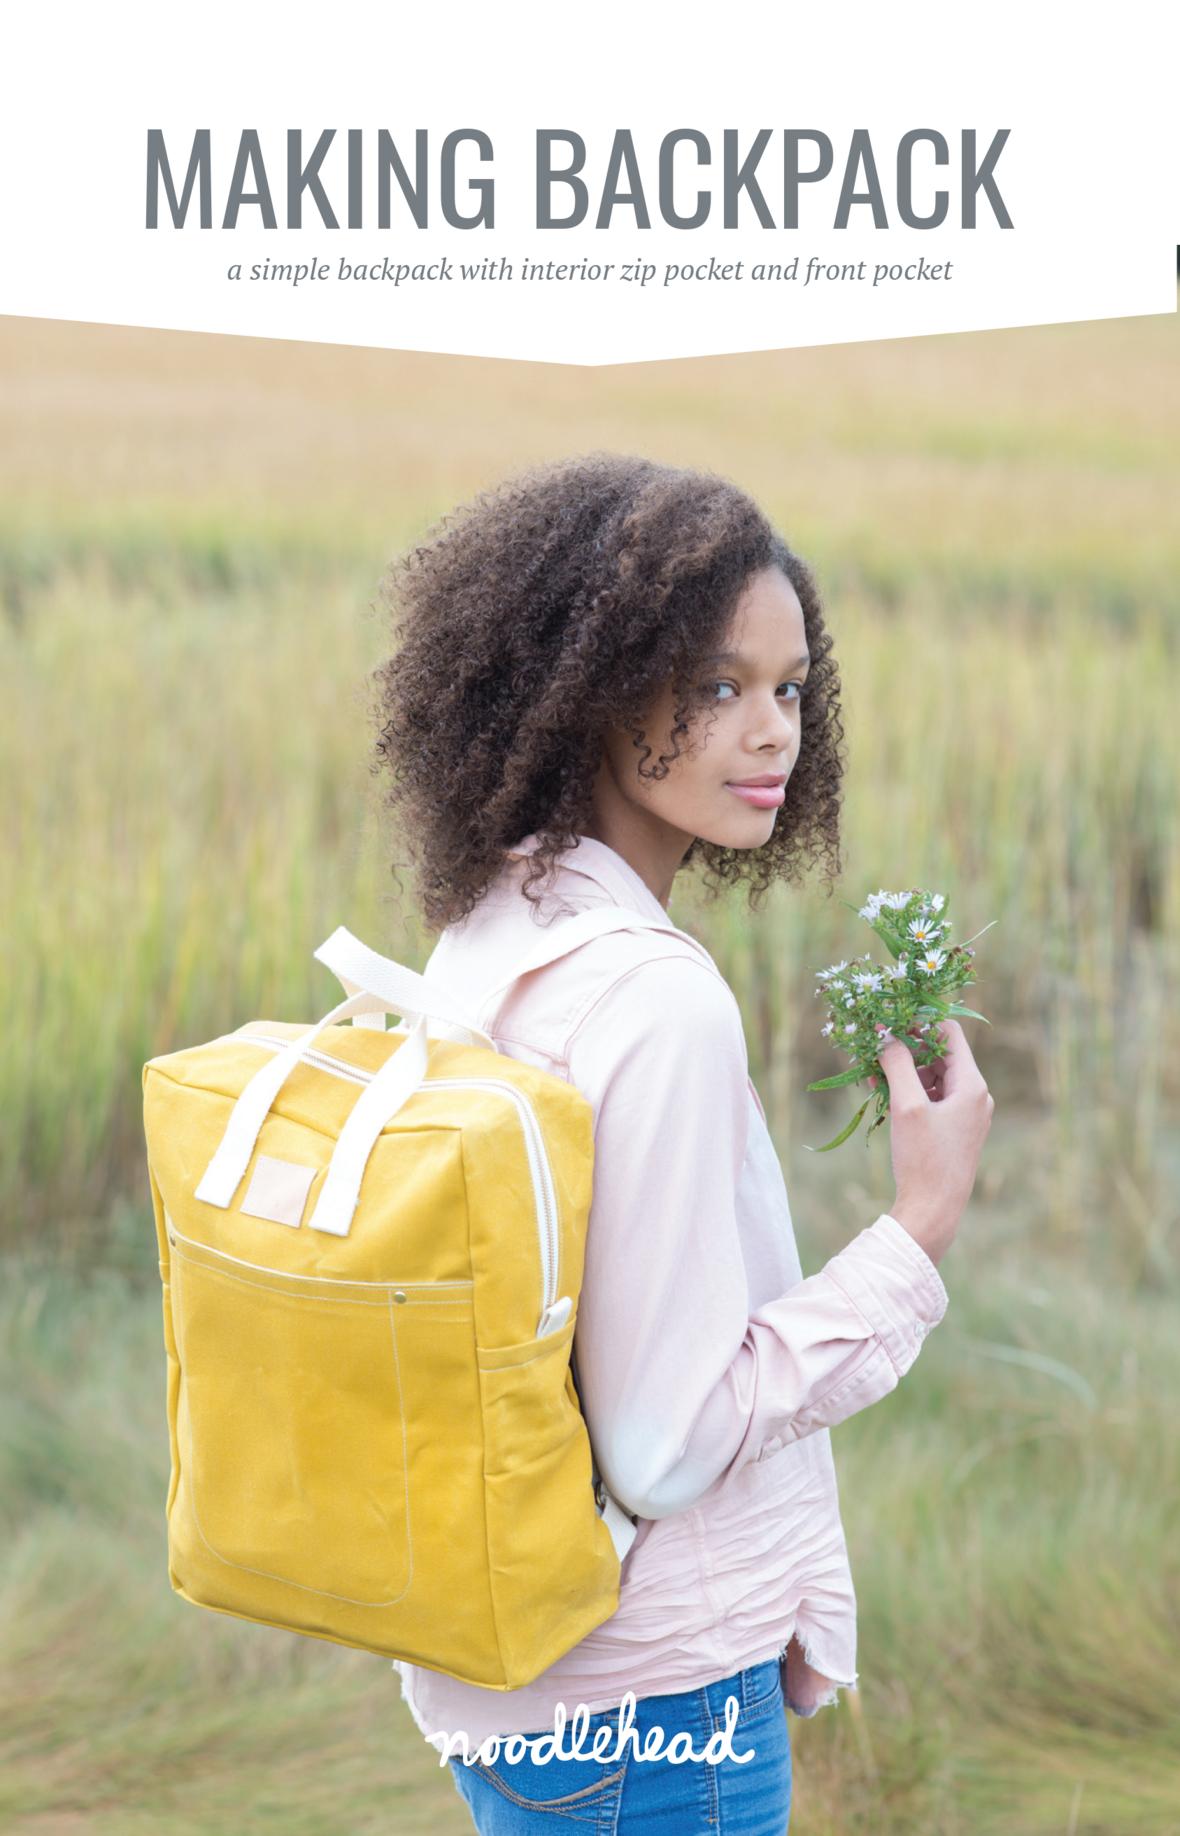 noodlehead-making backpack